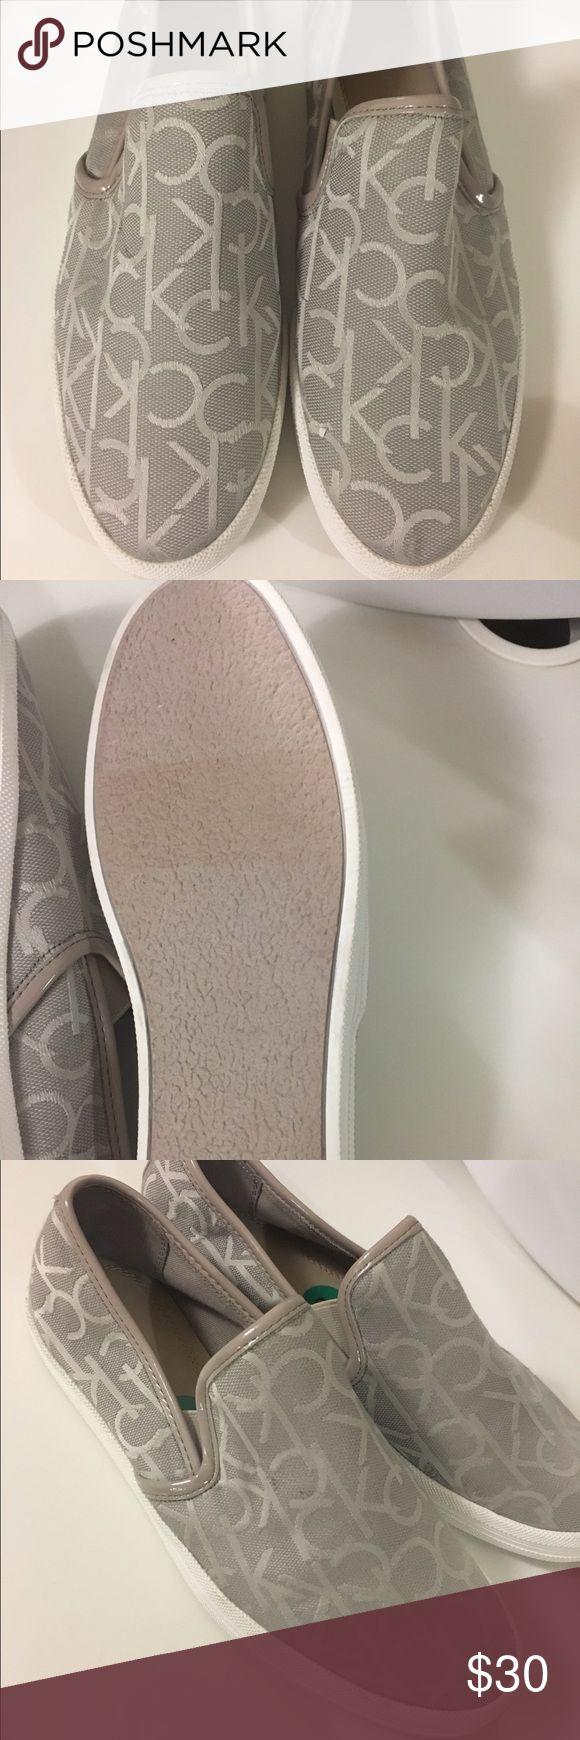 Calvin Klein sneakers Beige Calvin Klein slip on sneakers. Brand new, never been worn. Size US 8 Calvin Klein Shoes Sneakers